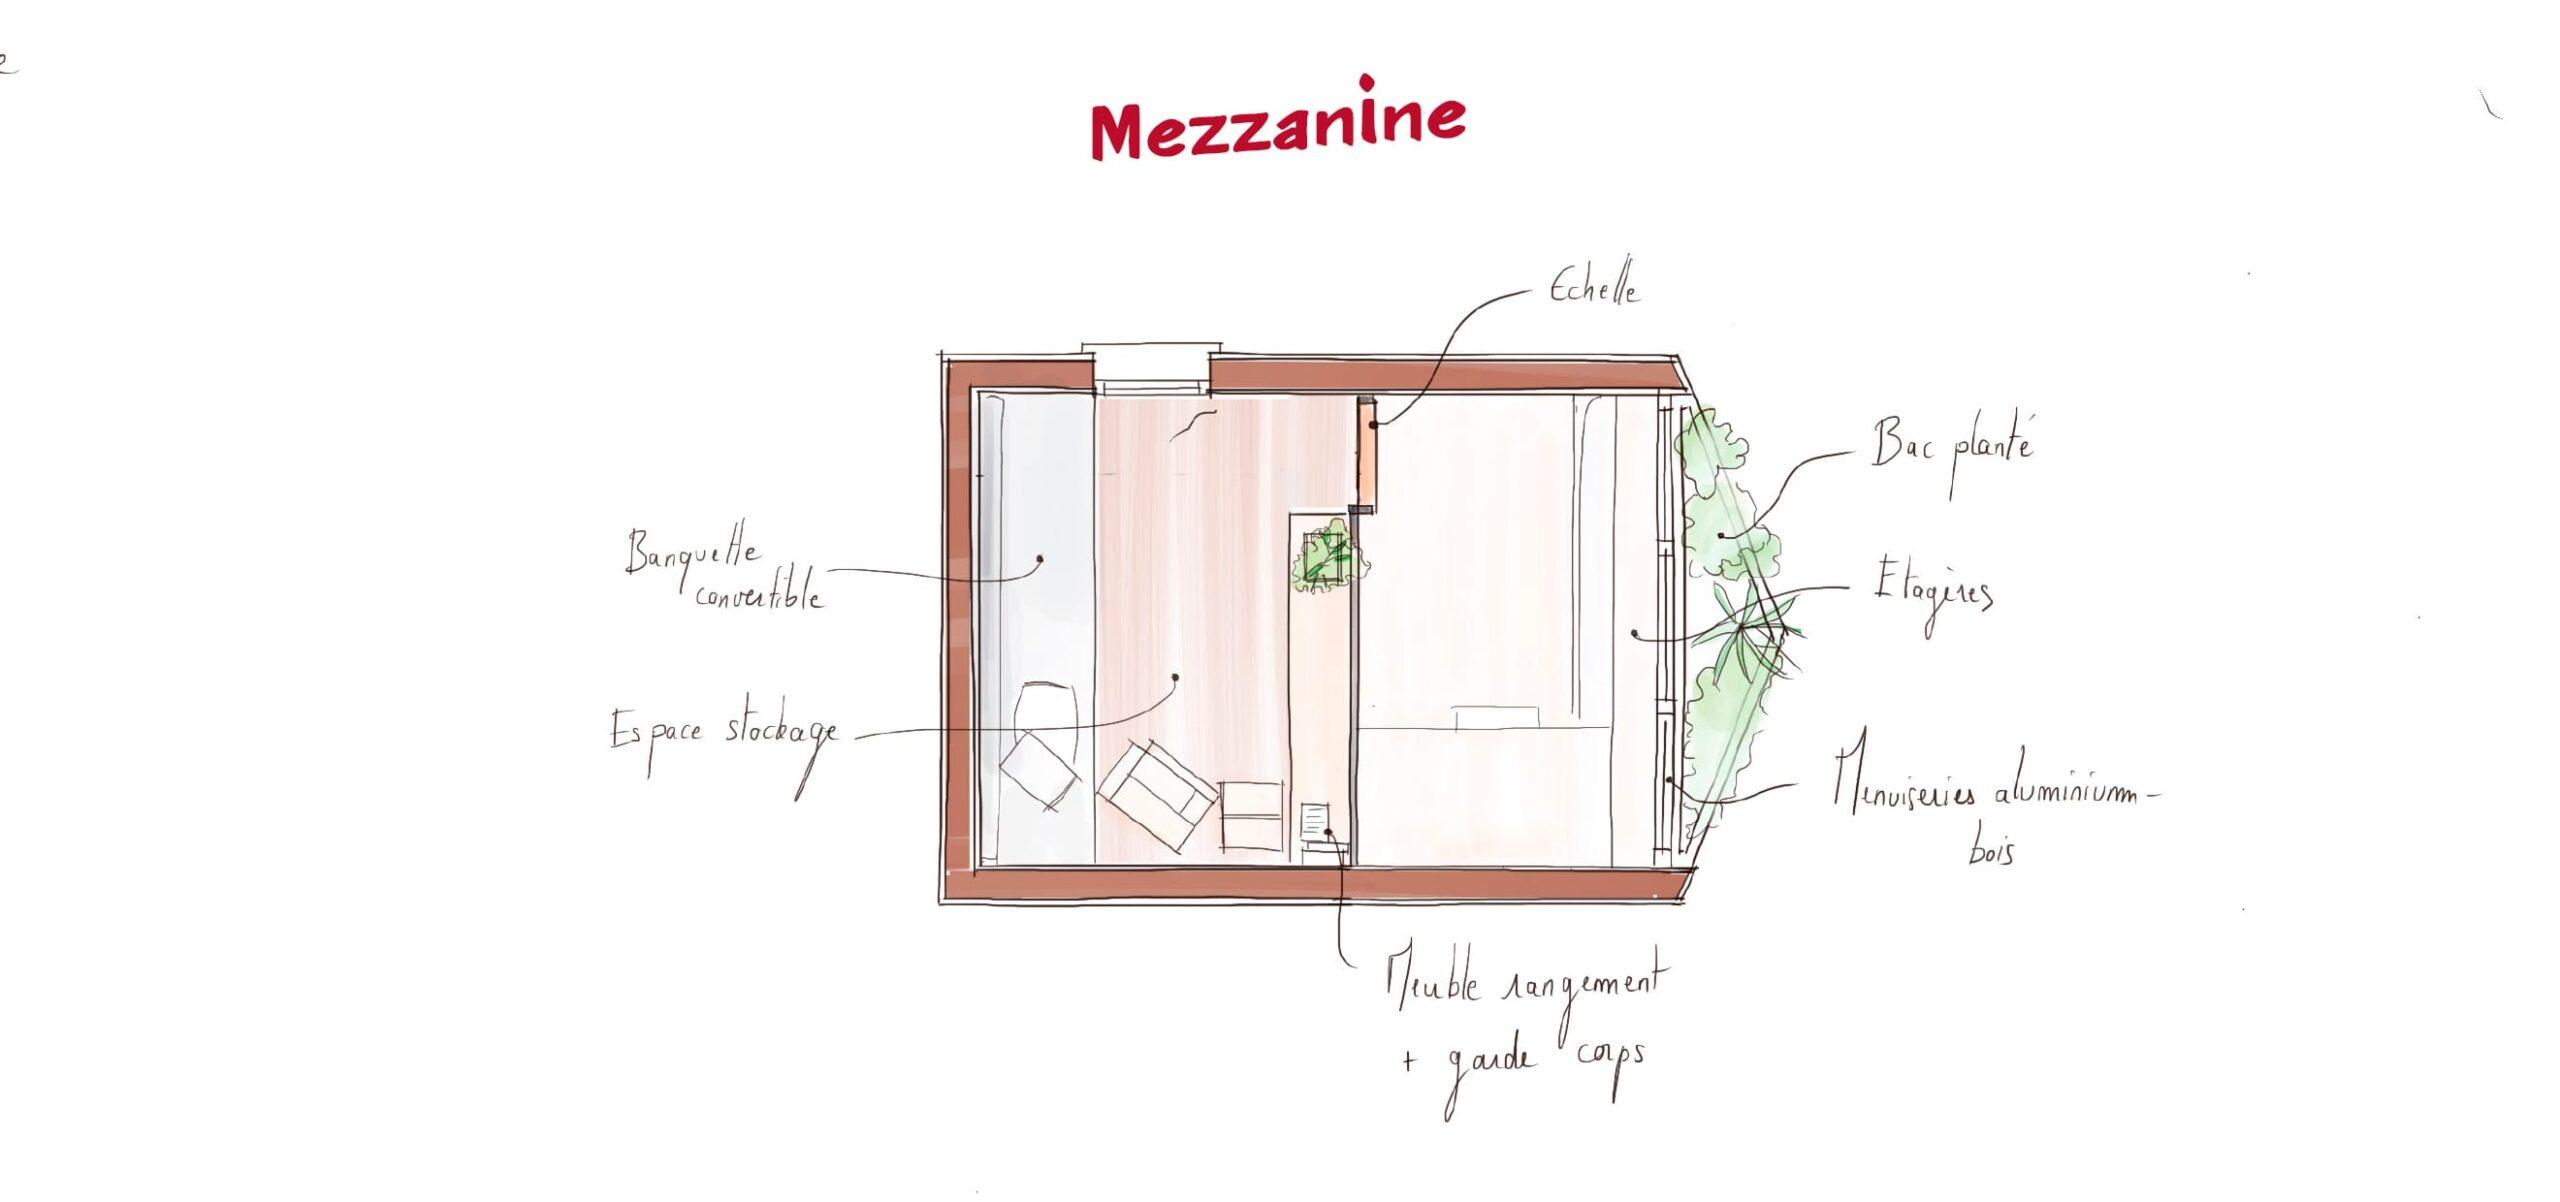 tiny-house-professionnel-office-mezzanine